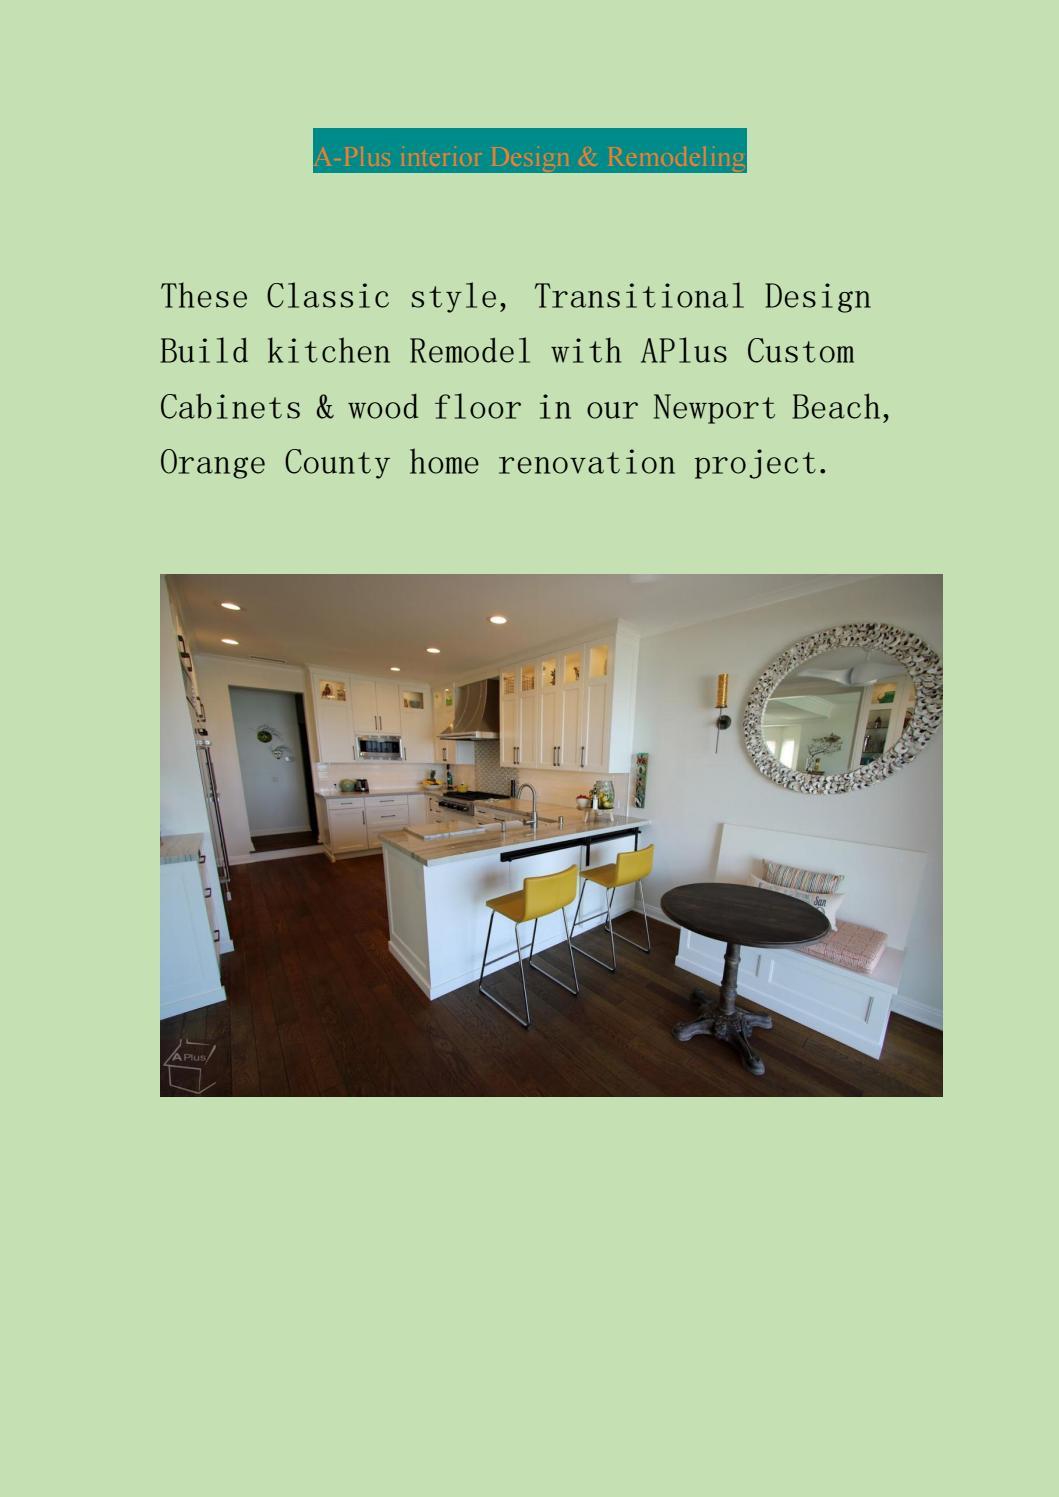 Irvine Kitchen Remodeling By Alex Tabrizi Issuu